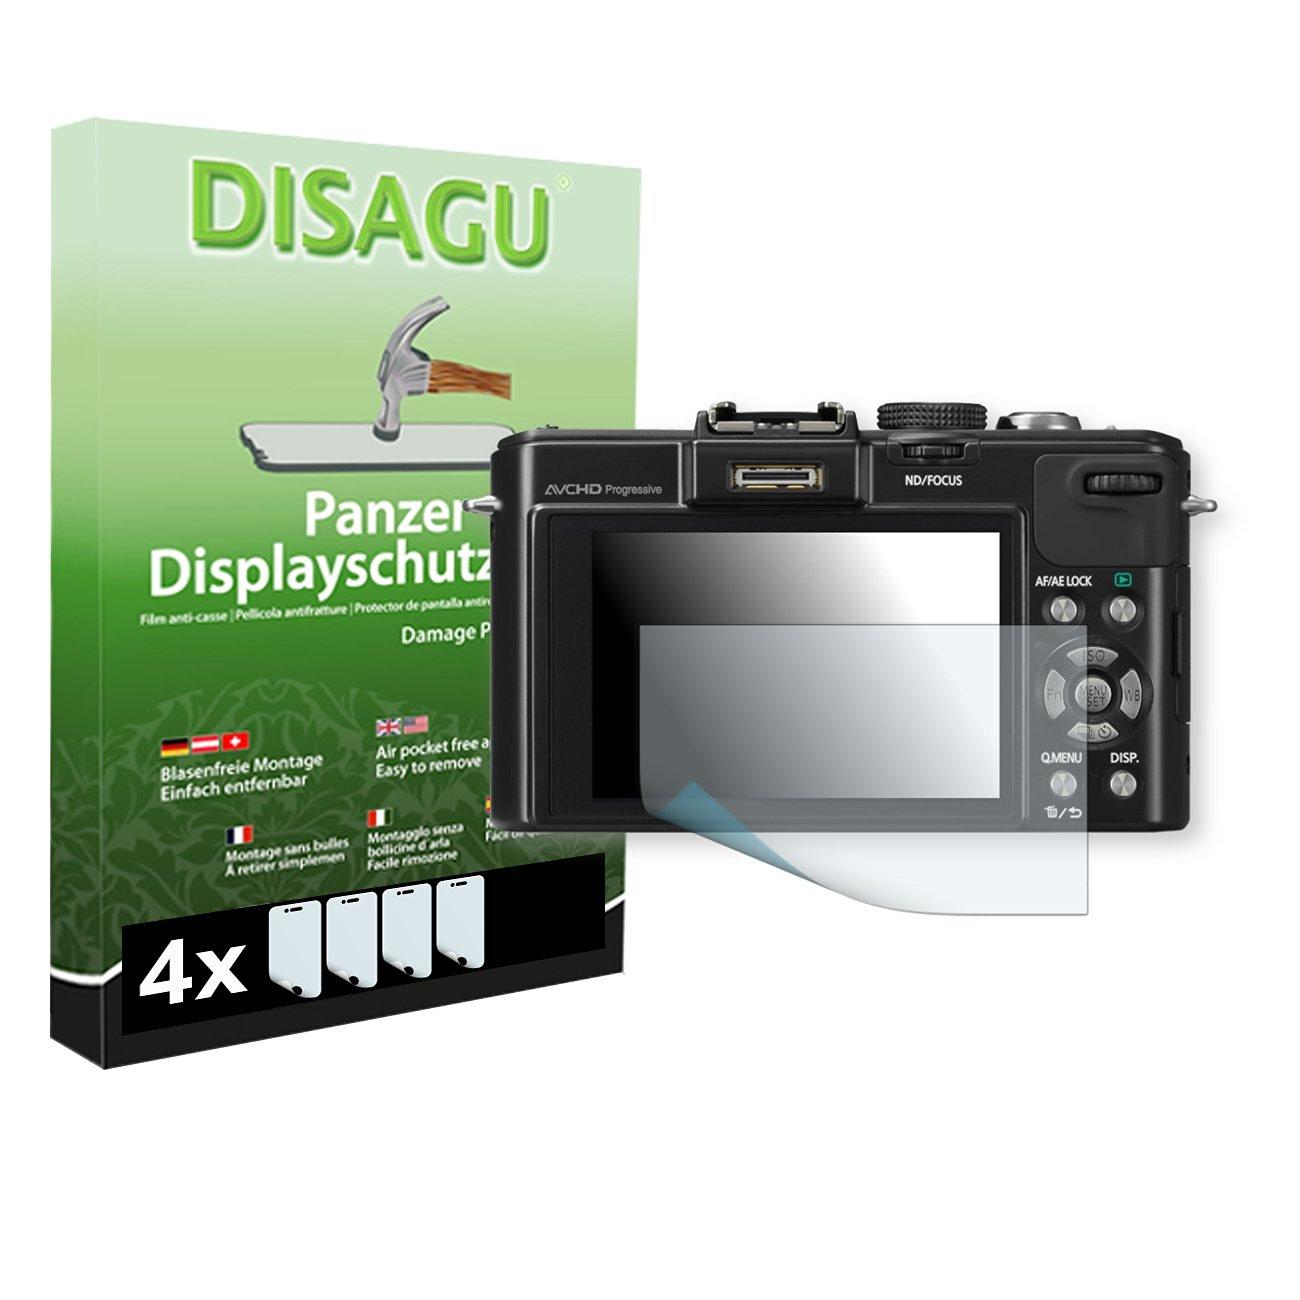 4 x DISAGU Armor screen protector for Panasonic Lumix-DMC LX7 screen fracture protection film